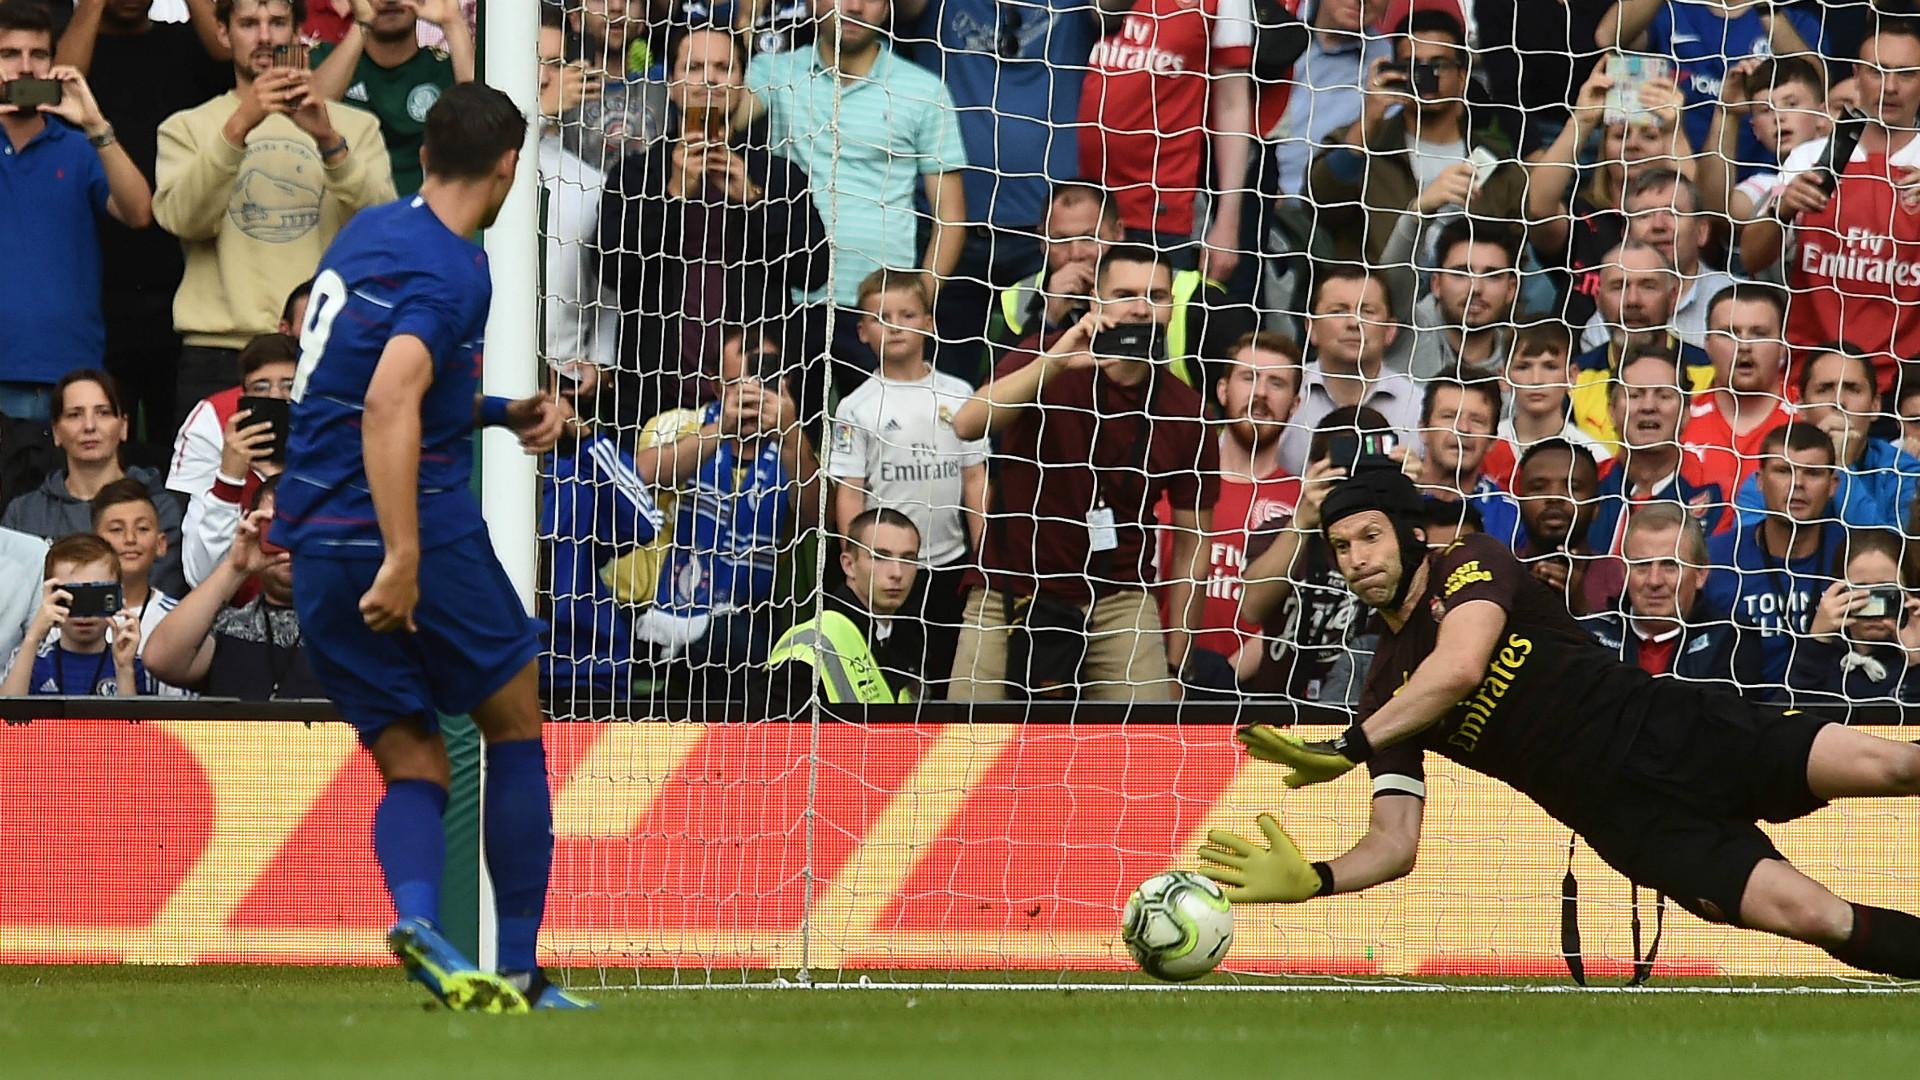 Alvaro Morata Petr Cech Chelsea Arsenal 2018-19